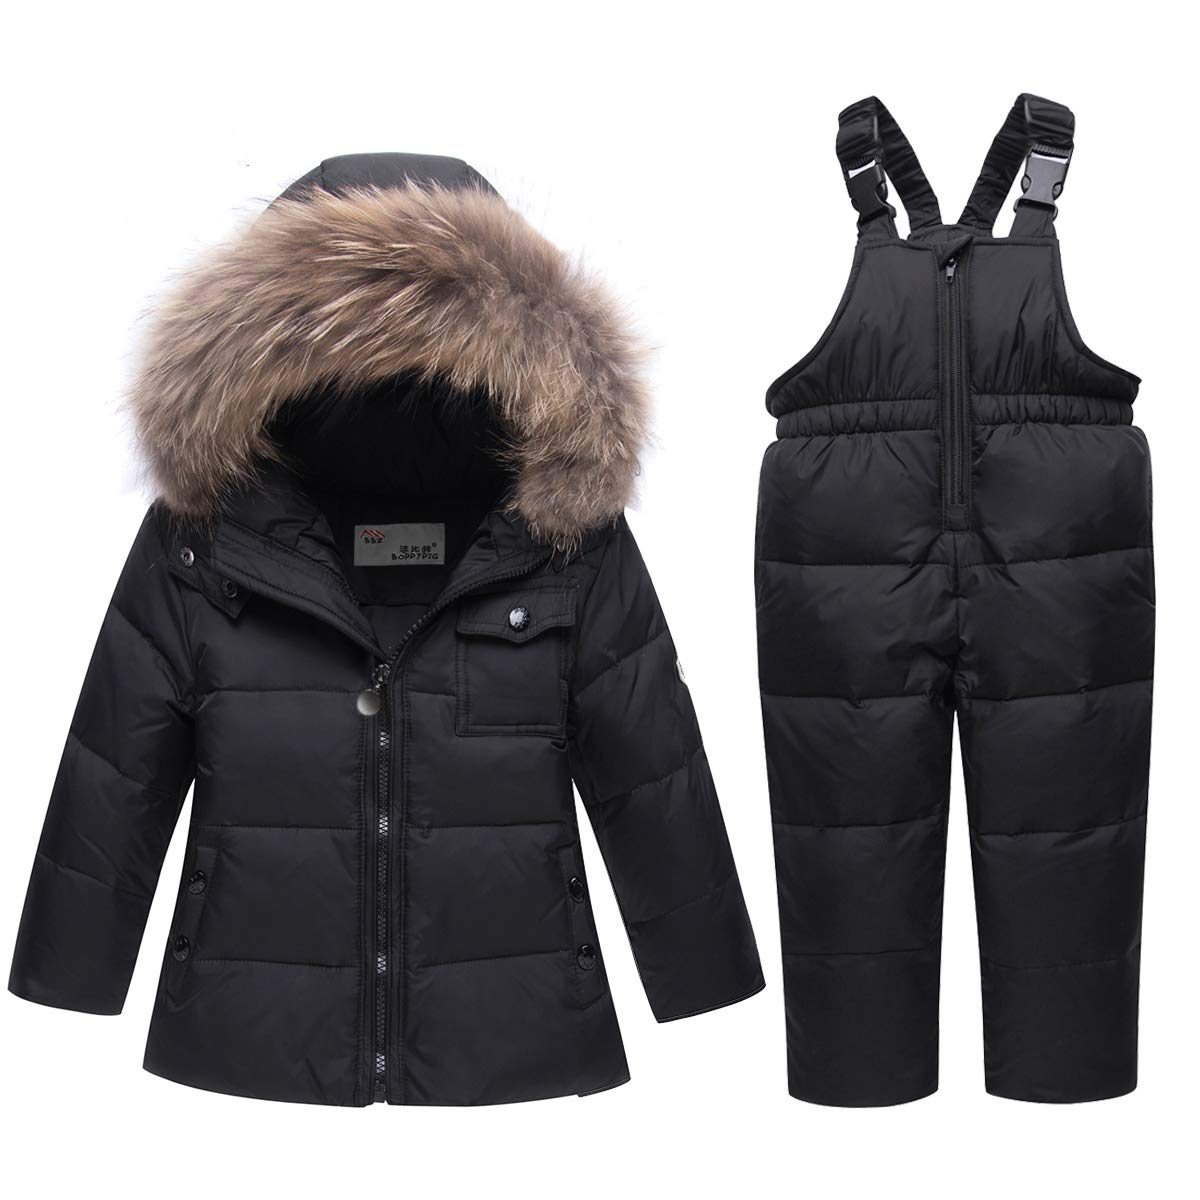 SANMIO Baby Boys Girls Two Piece Snowsuit, Toddler Winter Hooded Puffer Down Jacket Coat with Ski Bib Pants Black by SANMIO